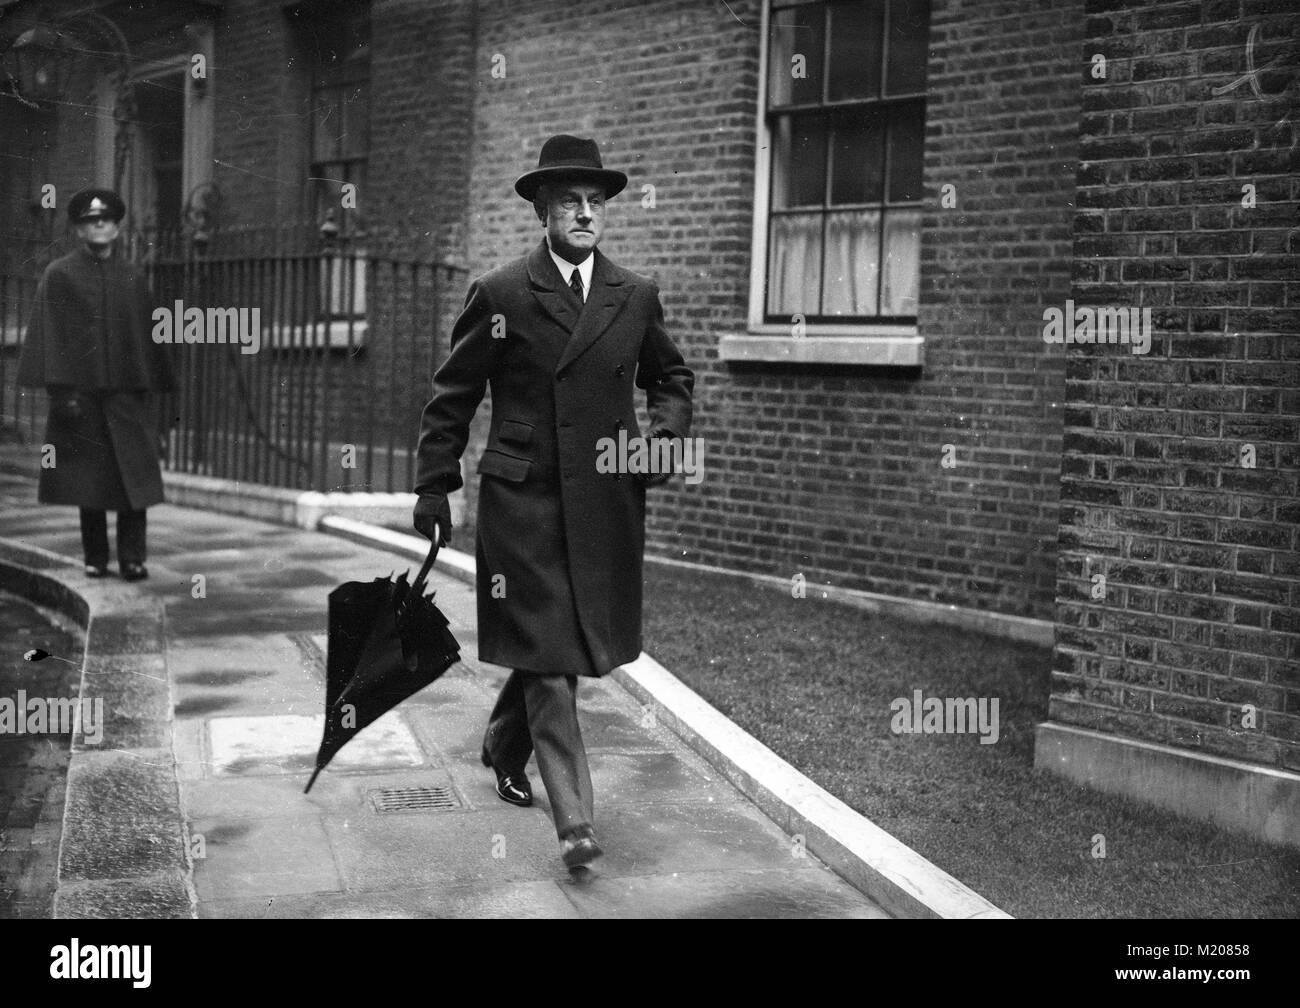 home secretary black and white stock photos & images - alamy